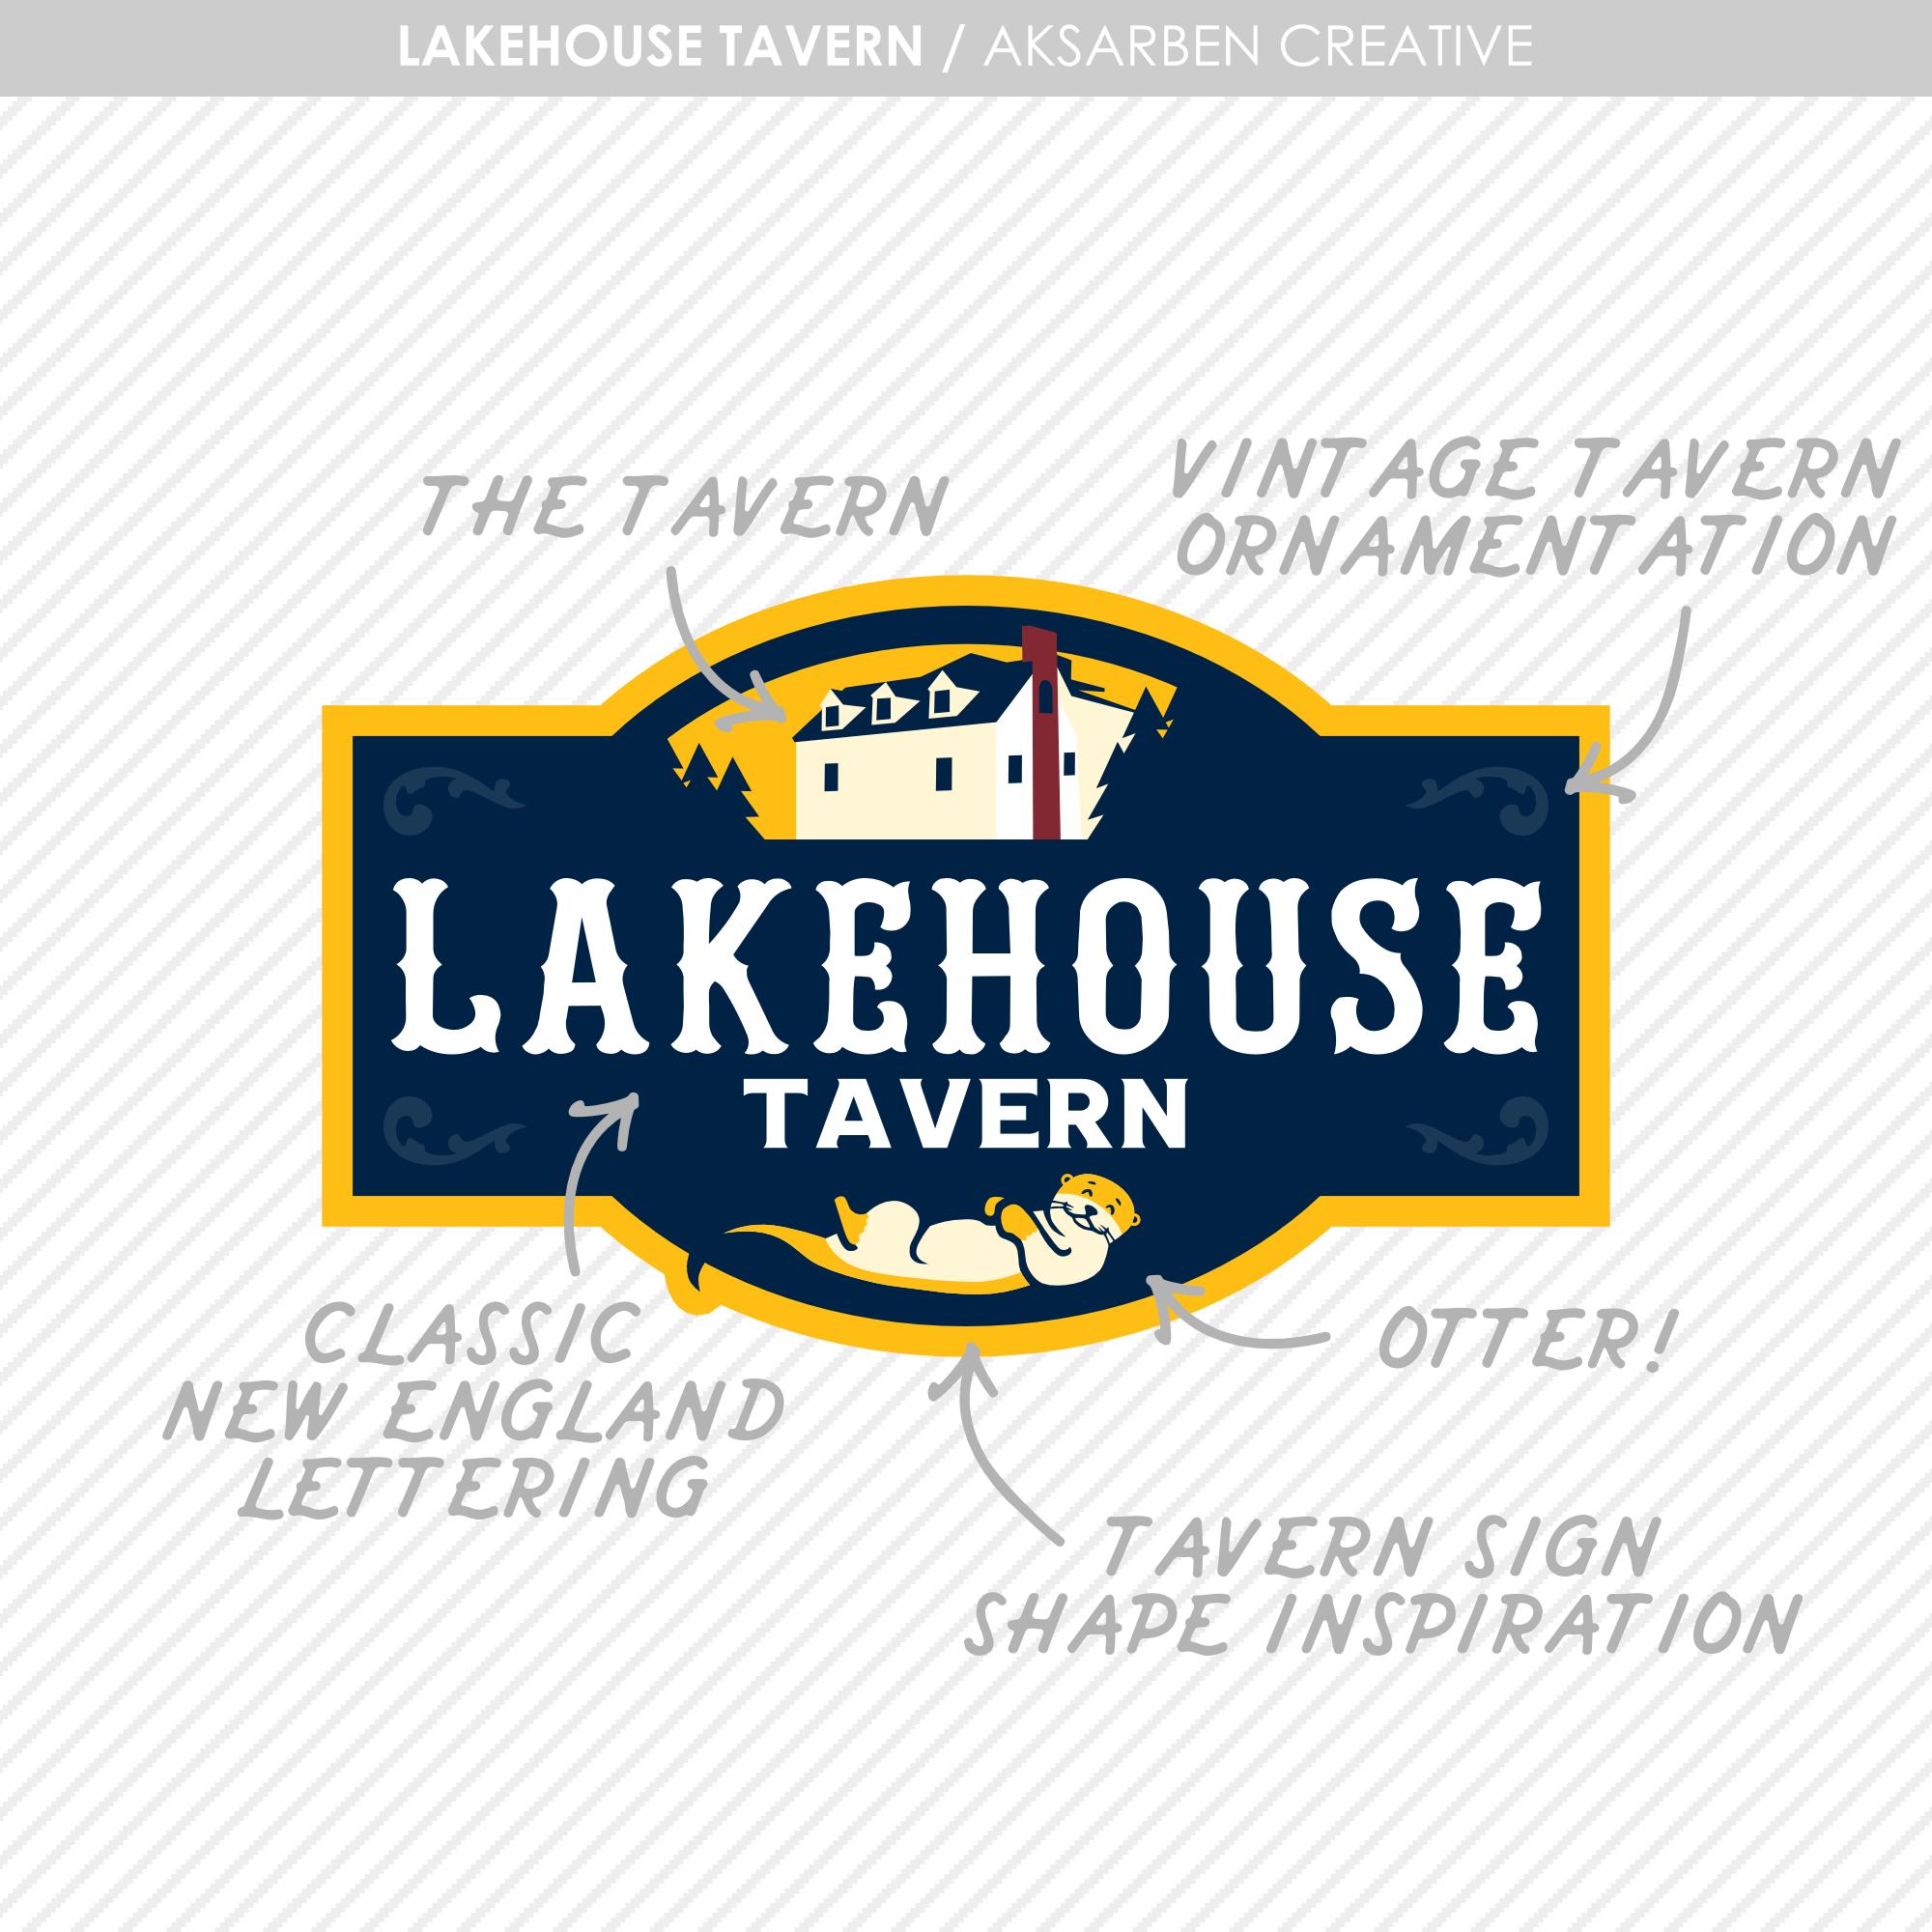 Lakehouse_Tavern_P6.png